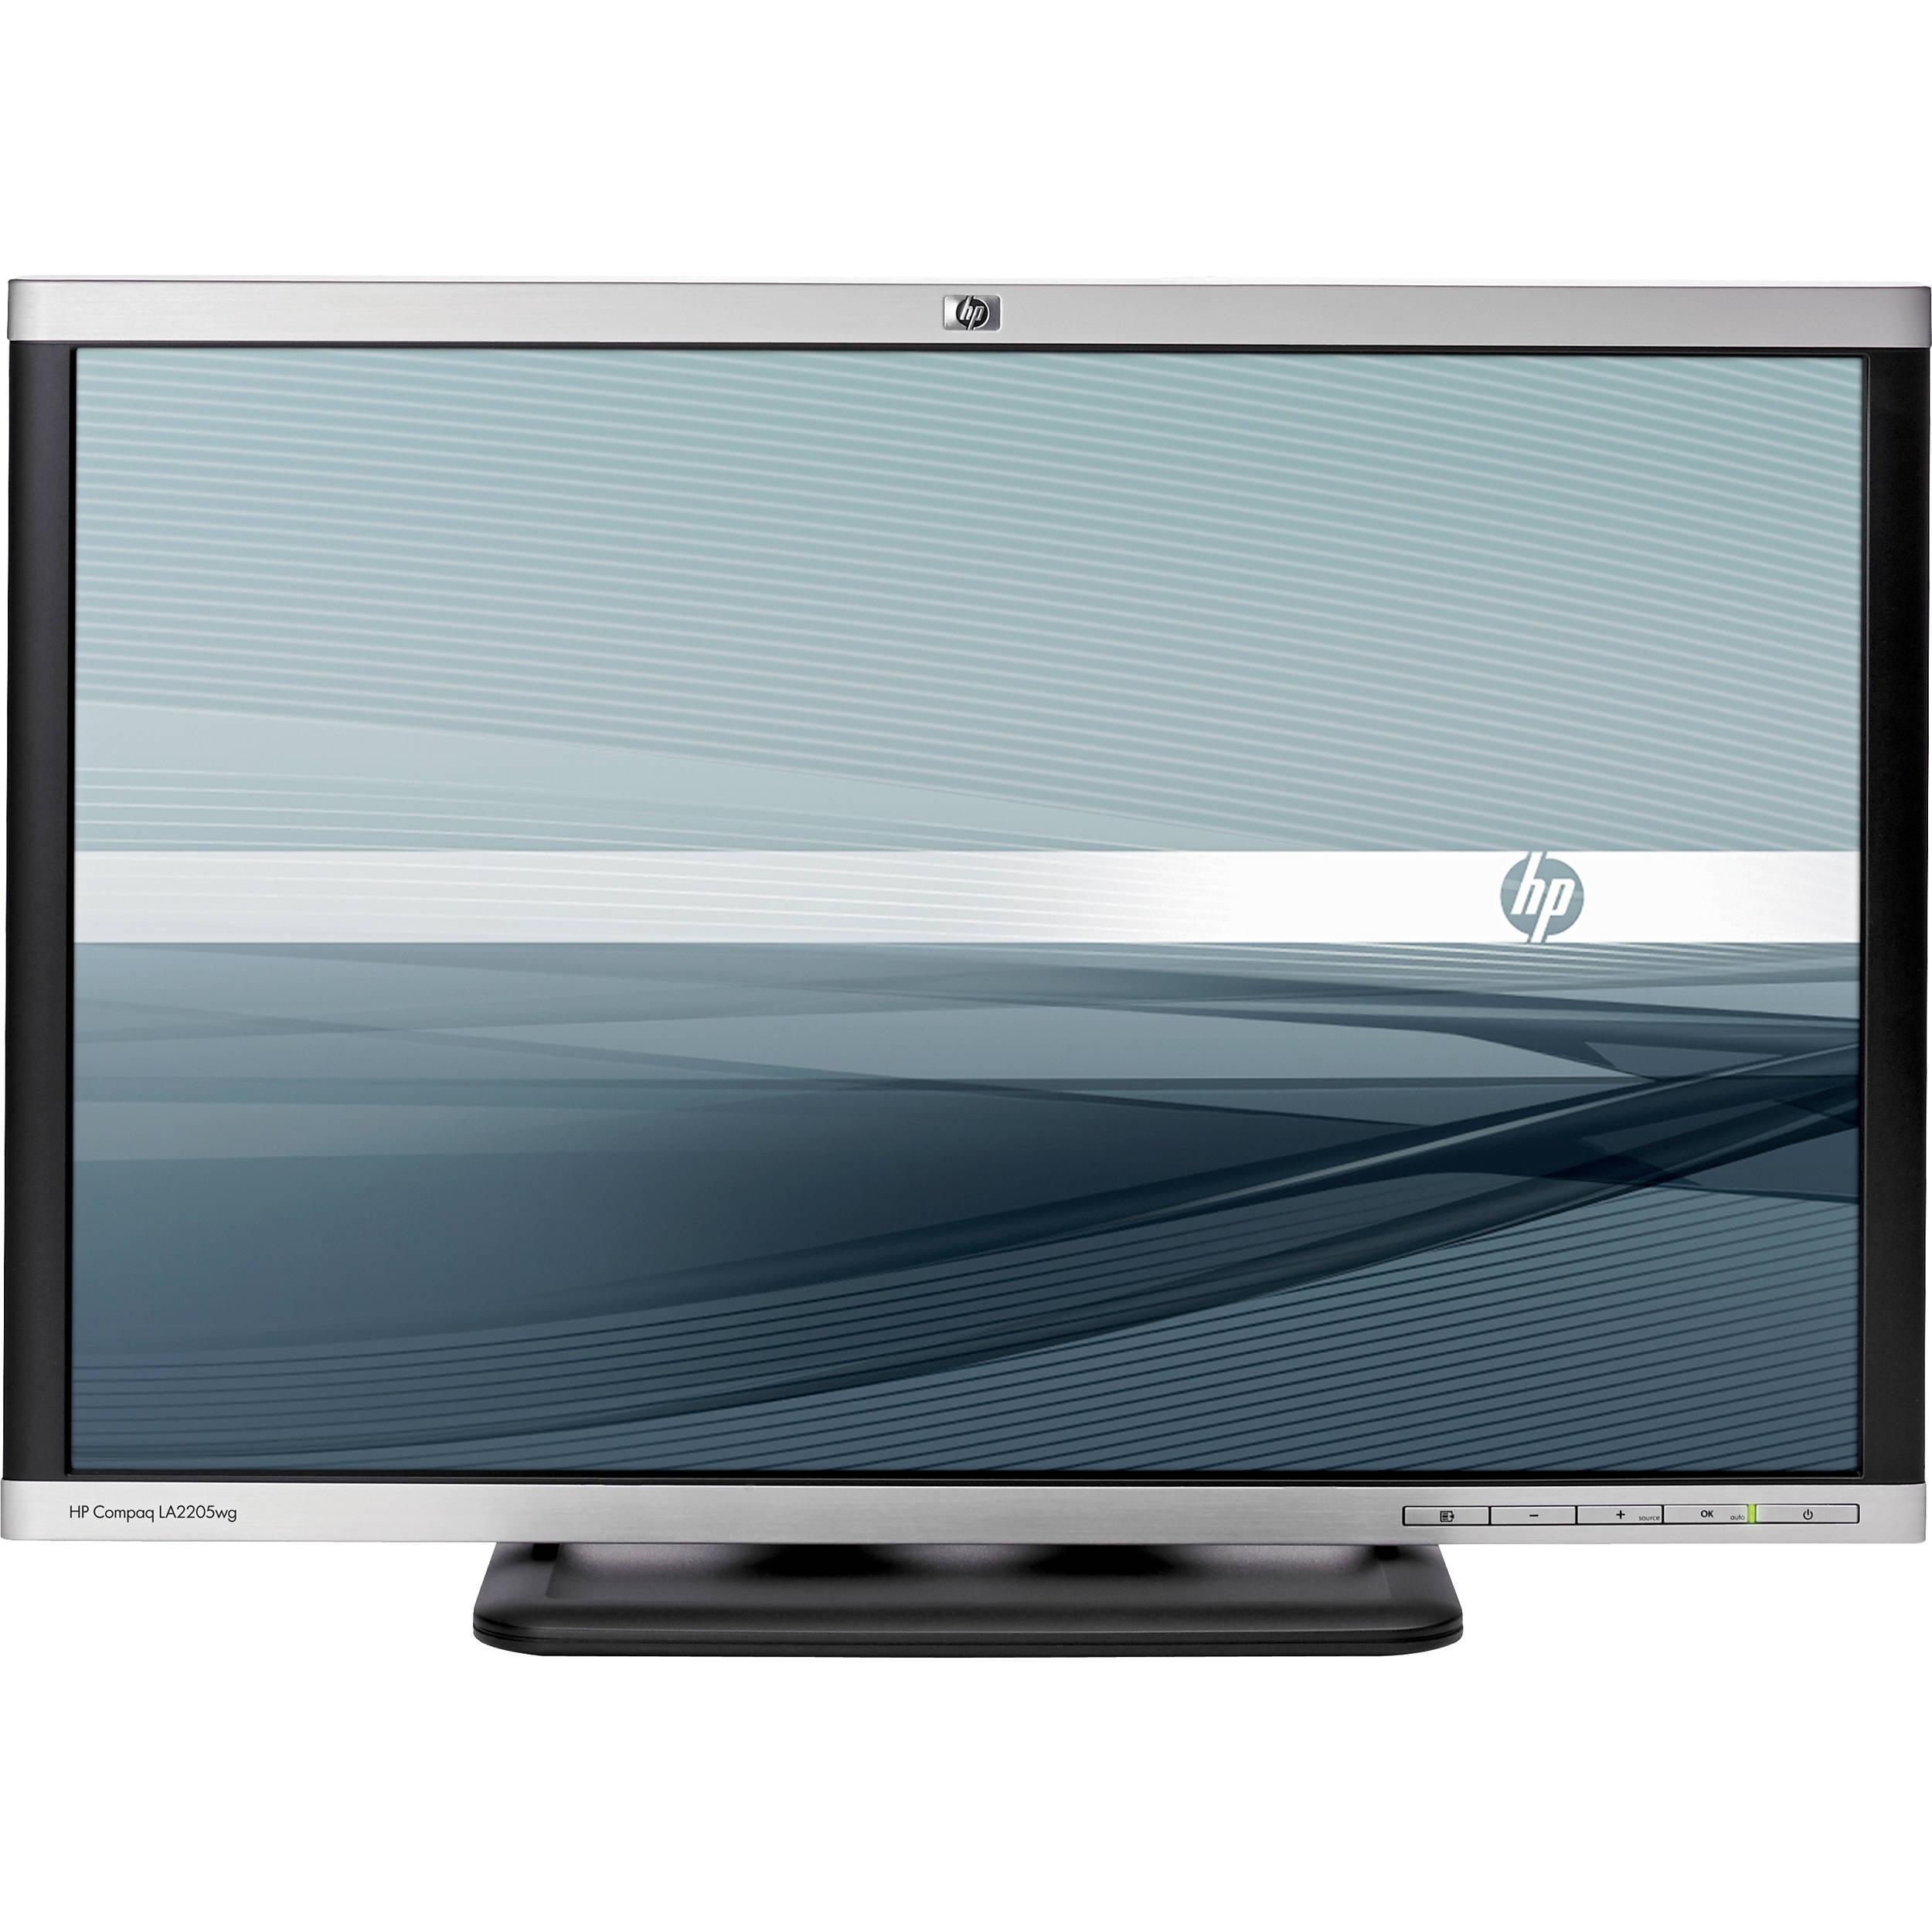 22-inch HP Compaq LA2205WG 1680 x 1050 LCD Monitor Black/Silver